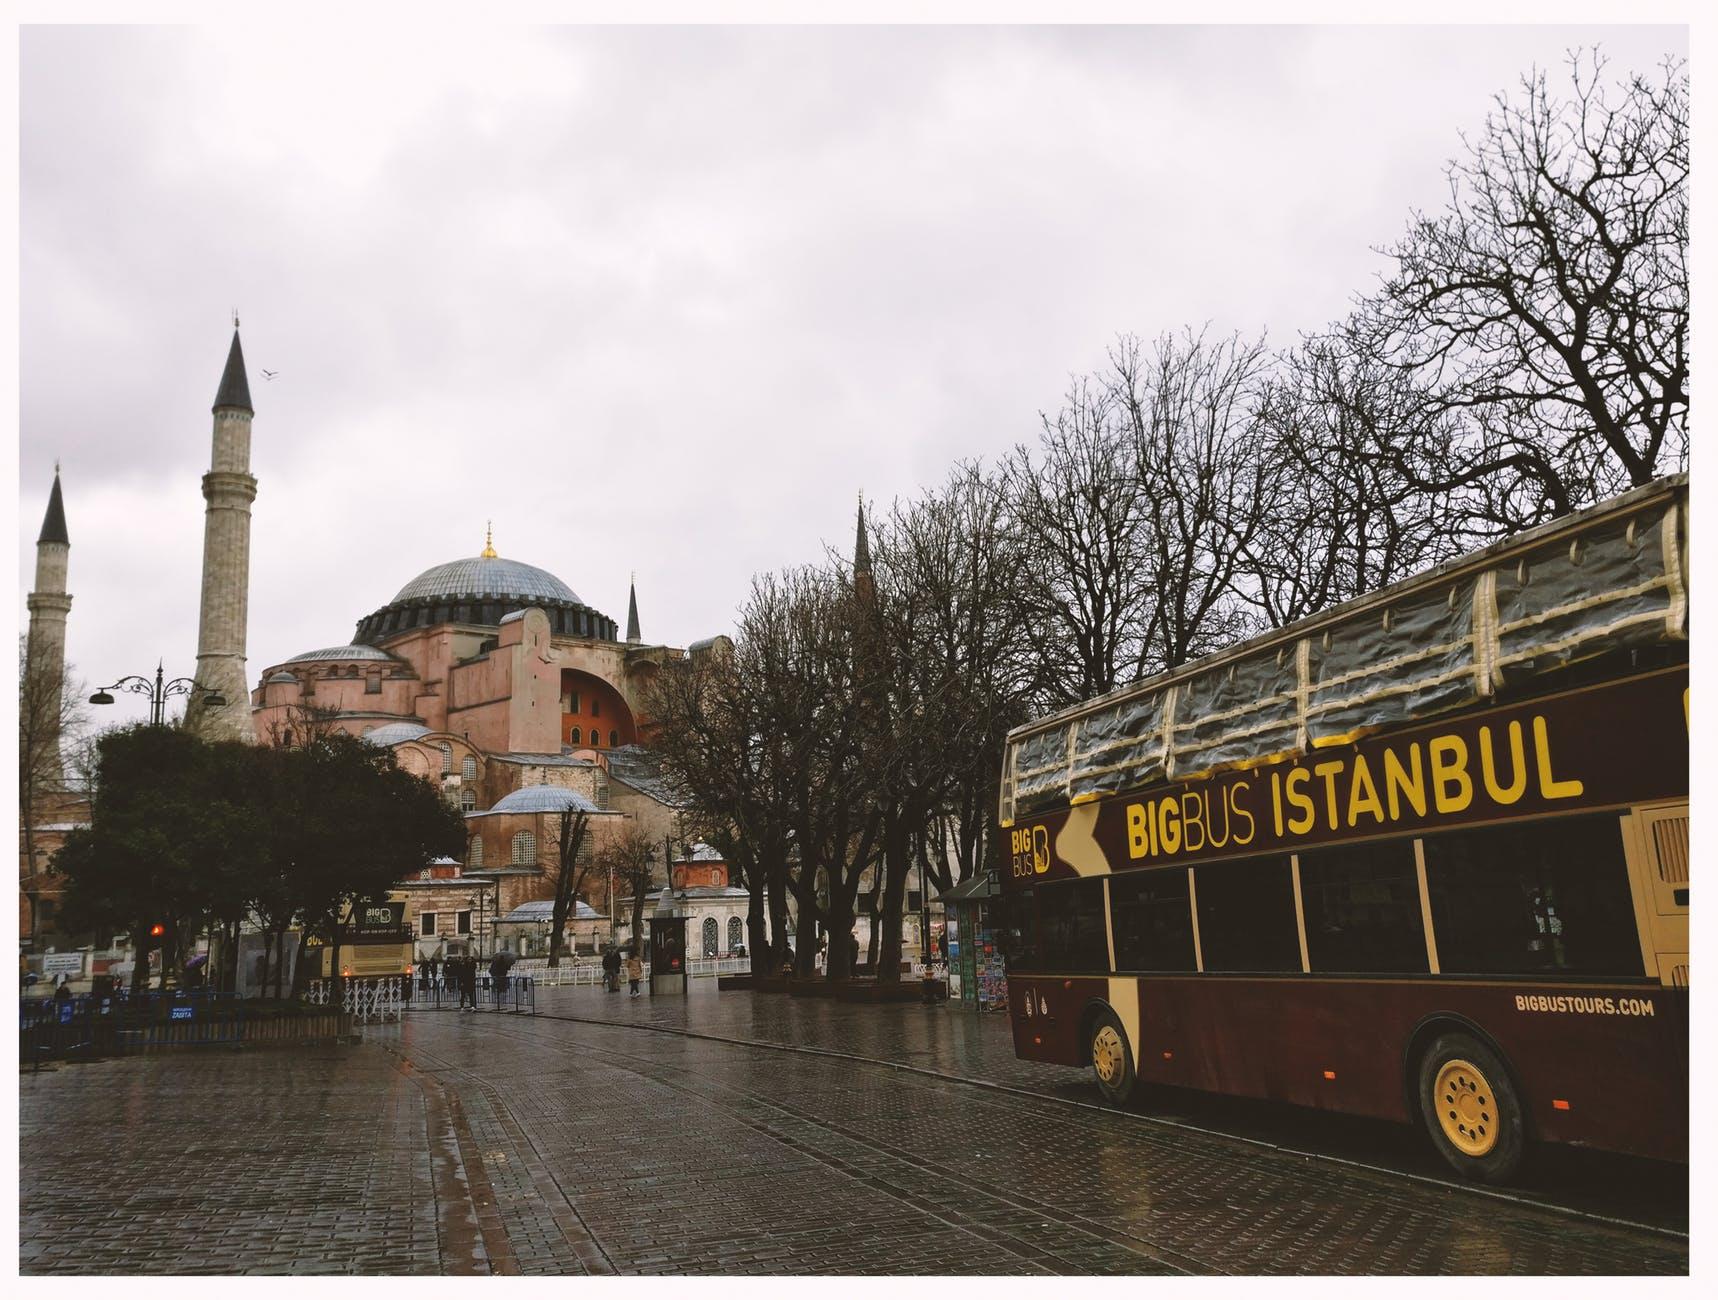 Turkey INTERNATIONAL HONEYMOON DESTINATIONS|ROMANTIC VACATIONS ON A BUDGET